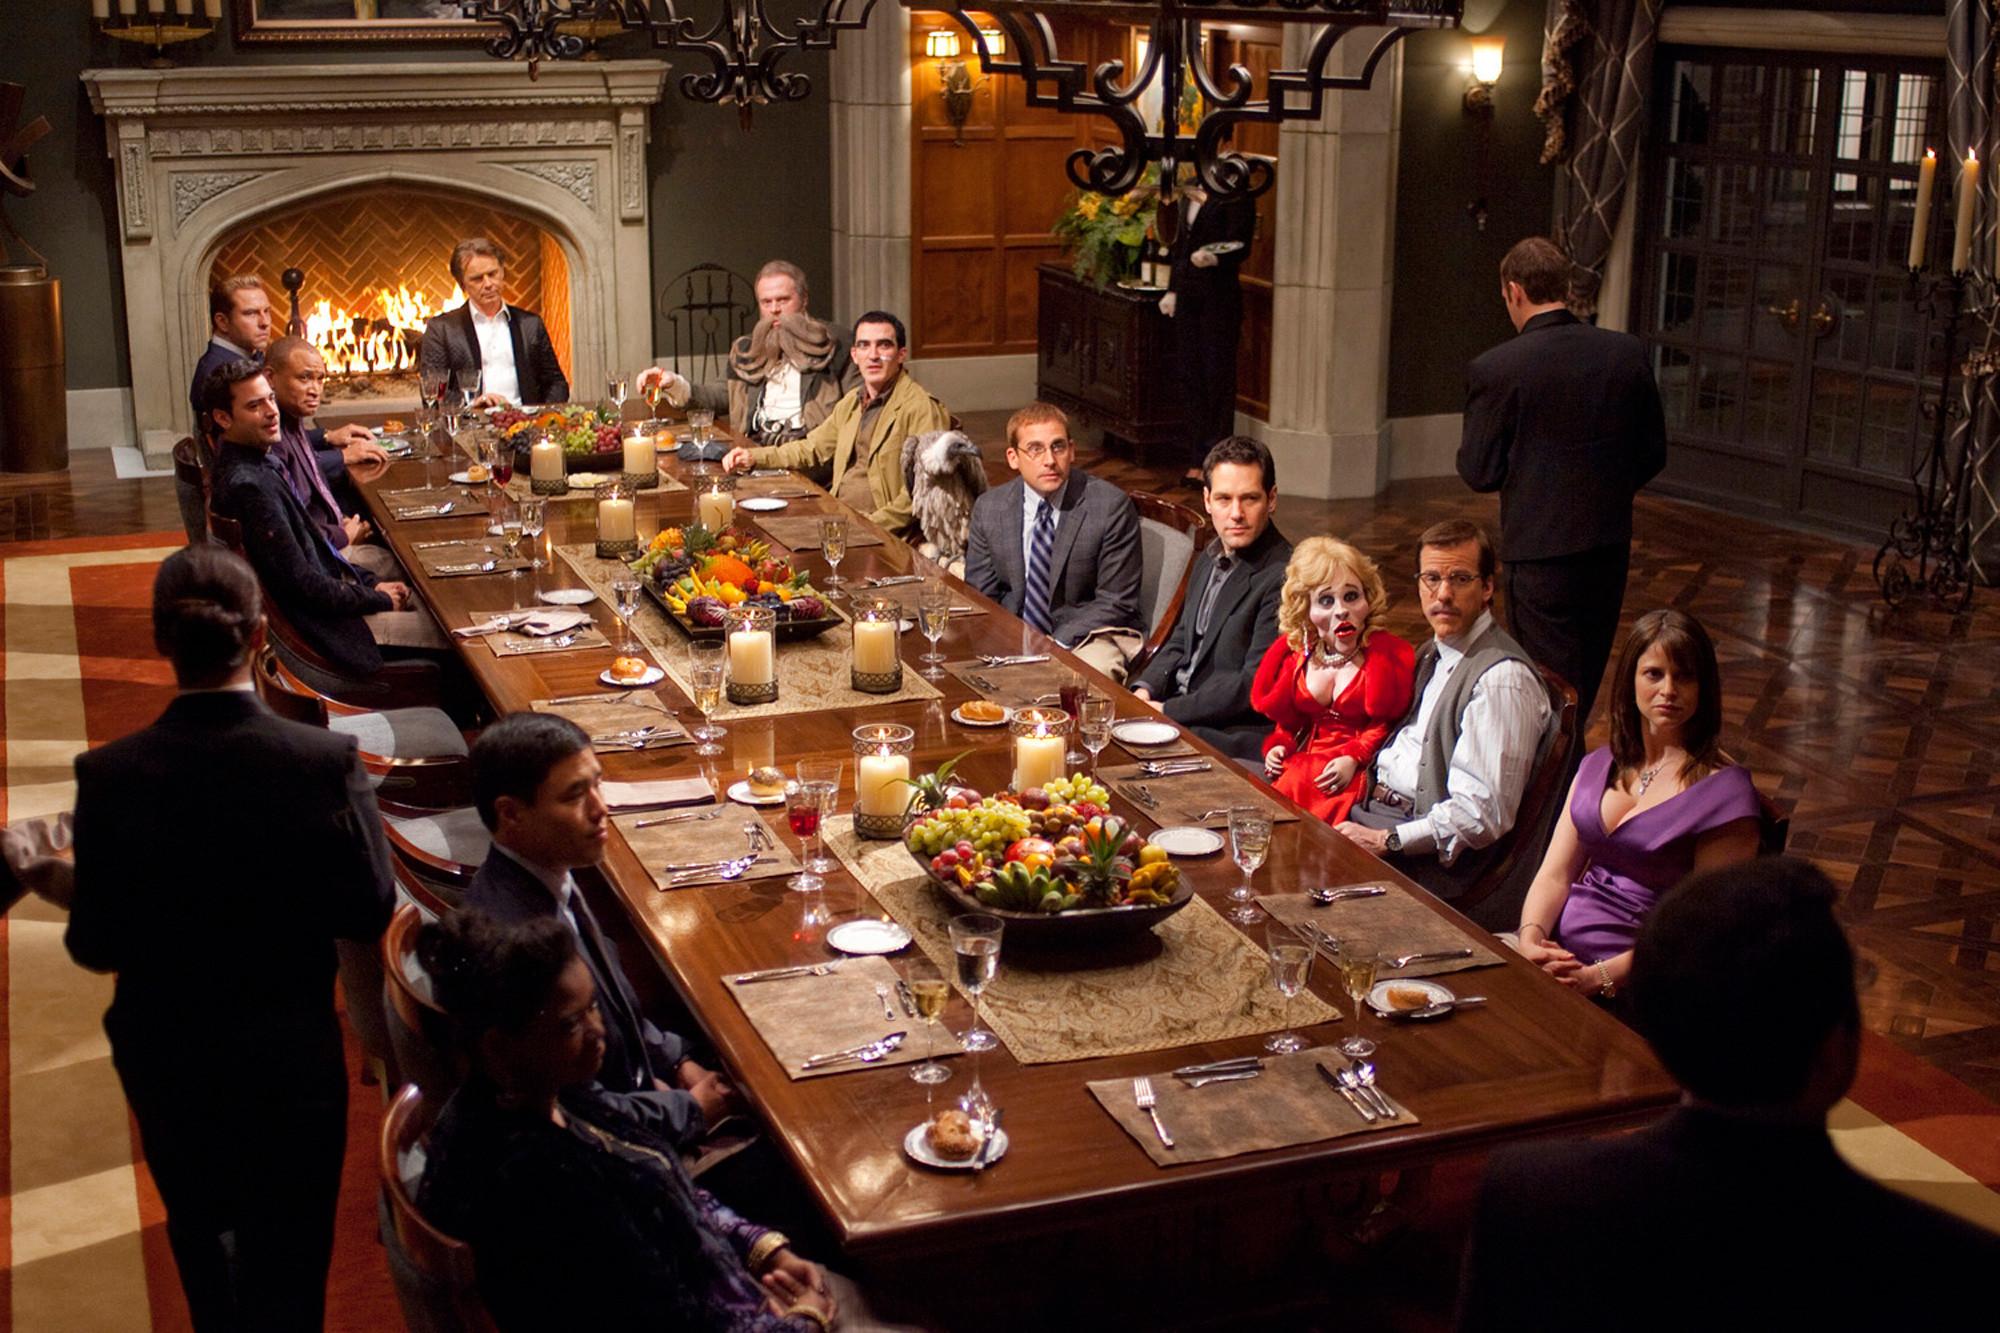 Dinner With Schmucks  Director Jay Roach Interview DINNER FOR SCHMUCKS AUSTIN